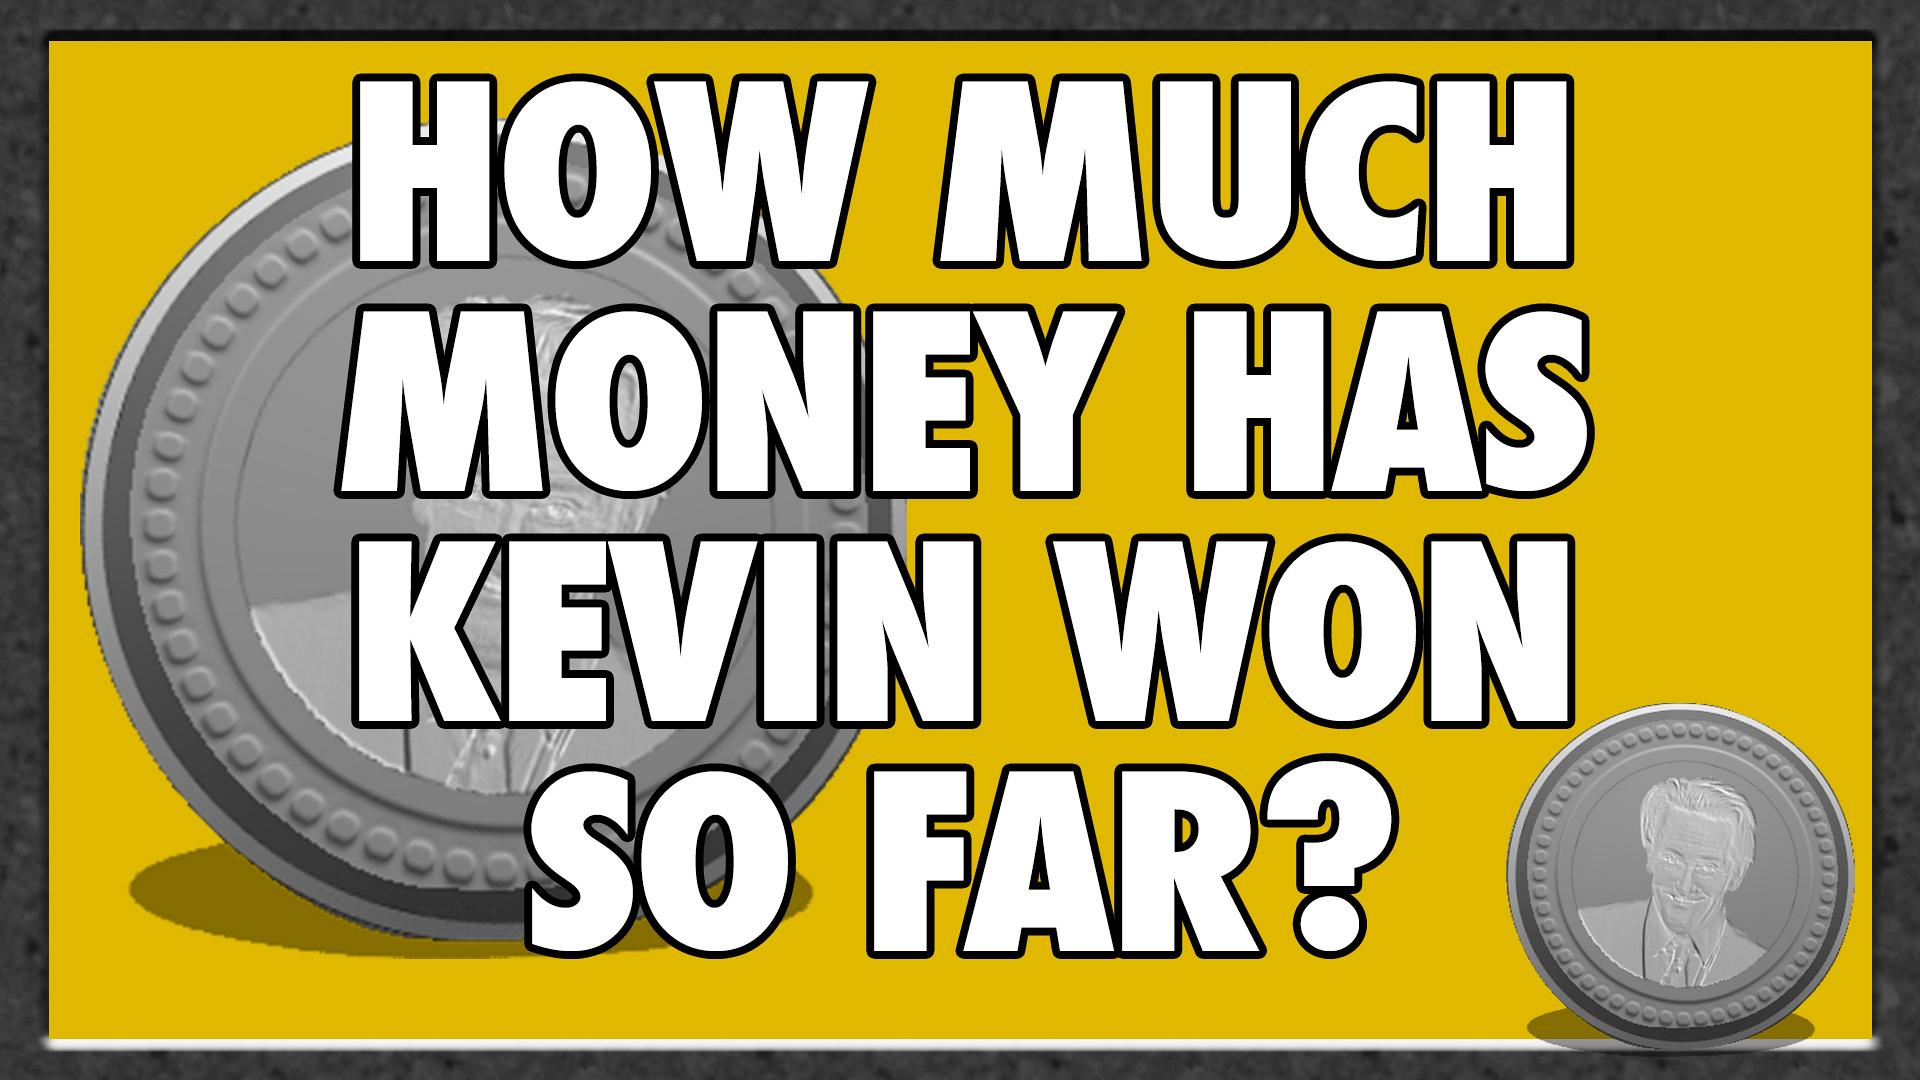 How much money has Kevin won so far?